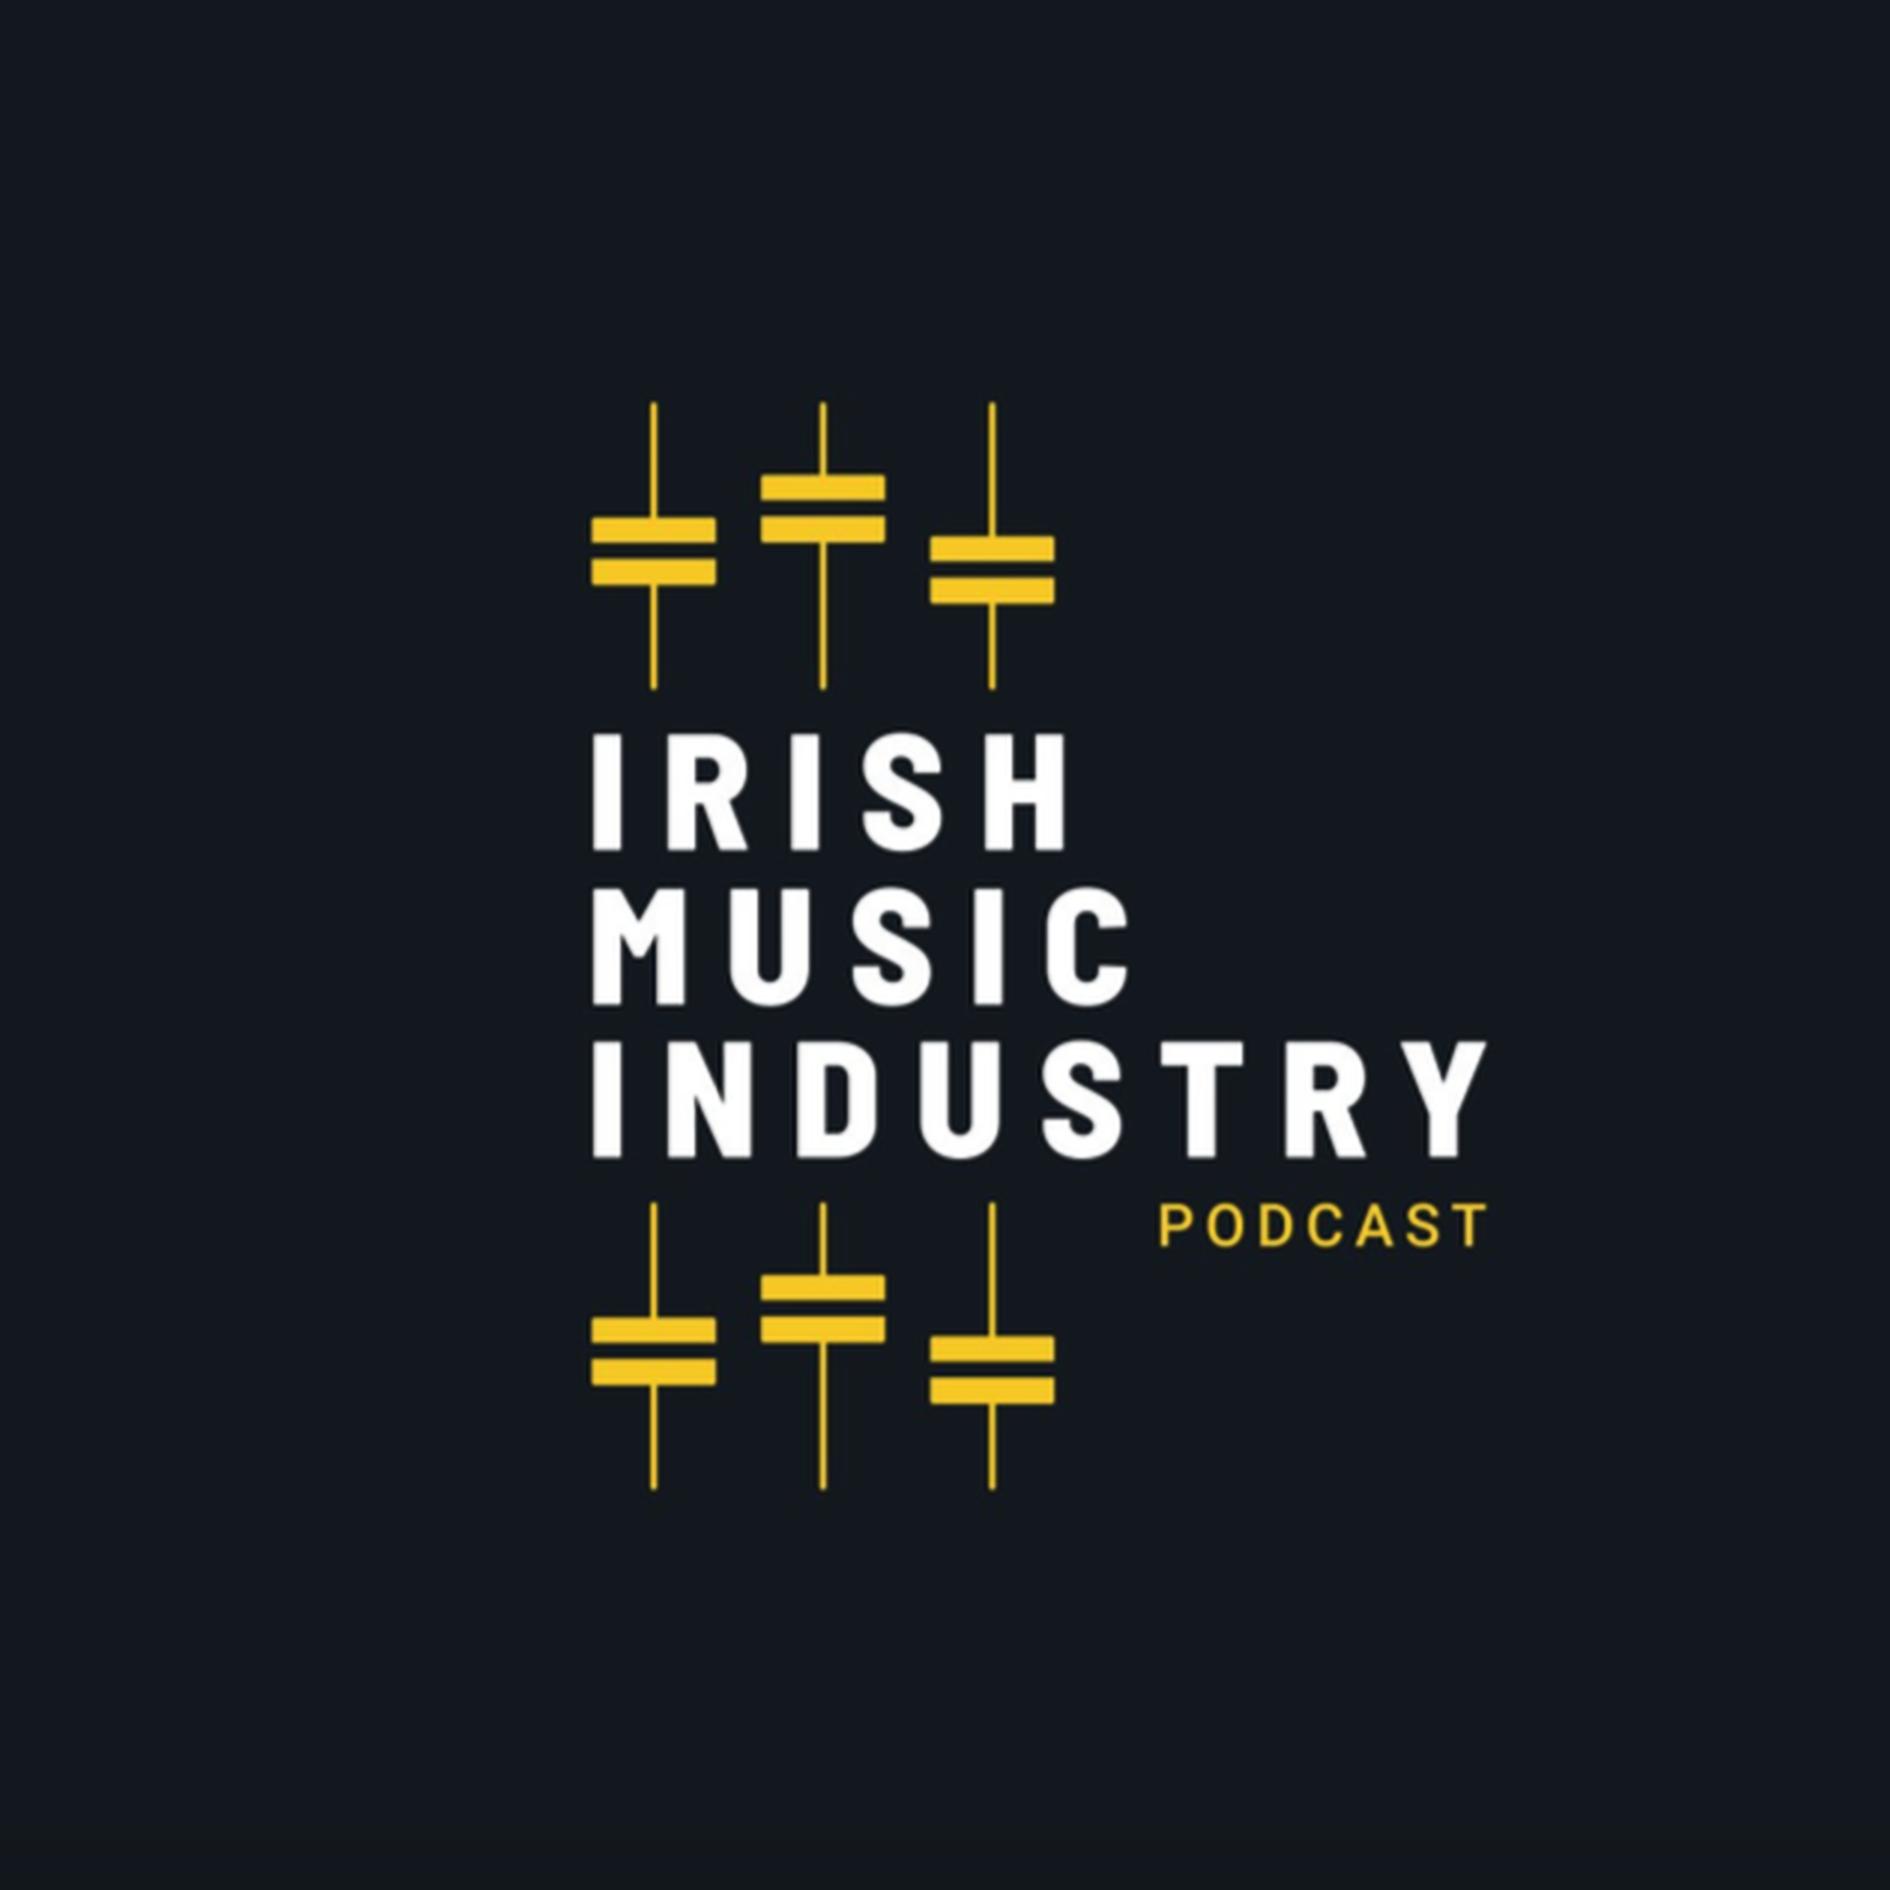 The Irish Music Industry Podcast